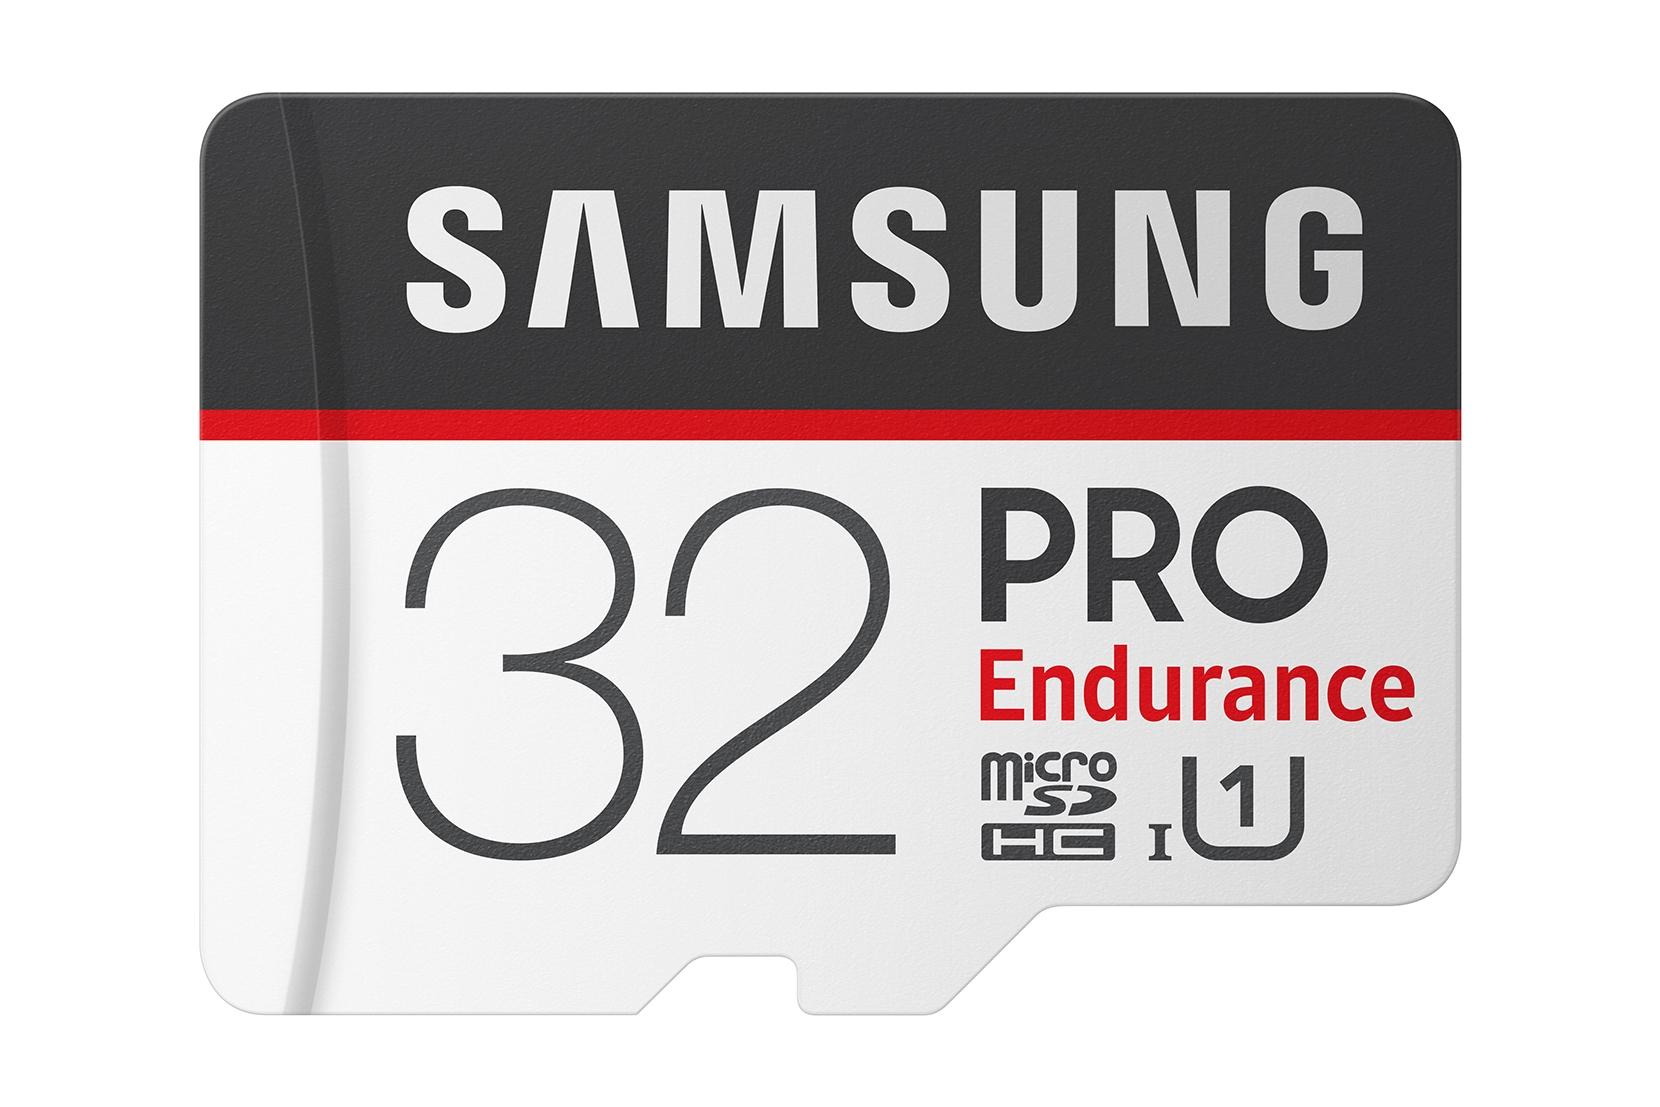 MicroSDHC PRO Endurance Memory Card w/ Adapter 32GB